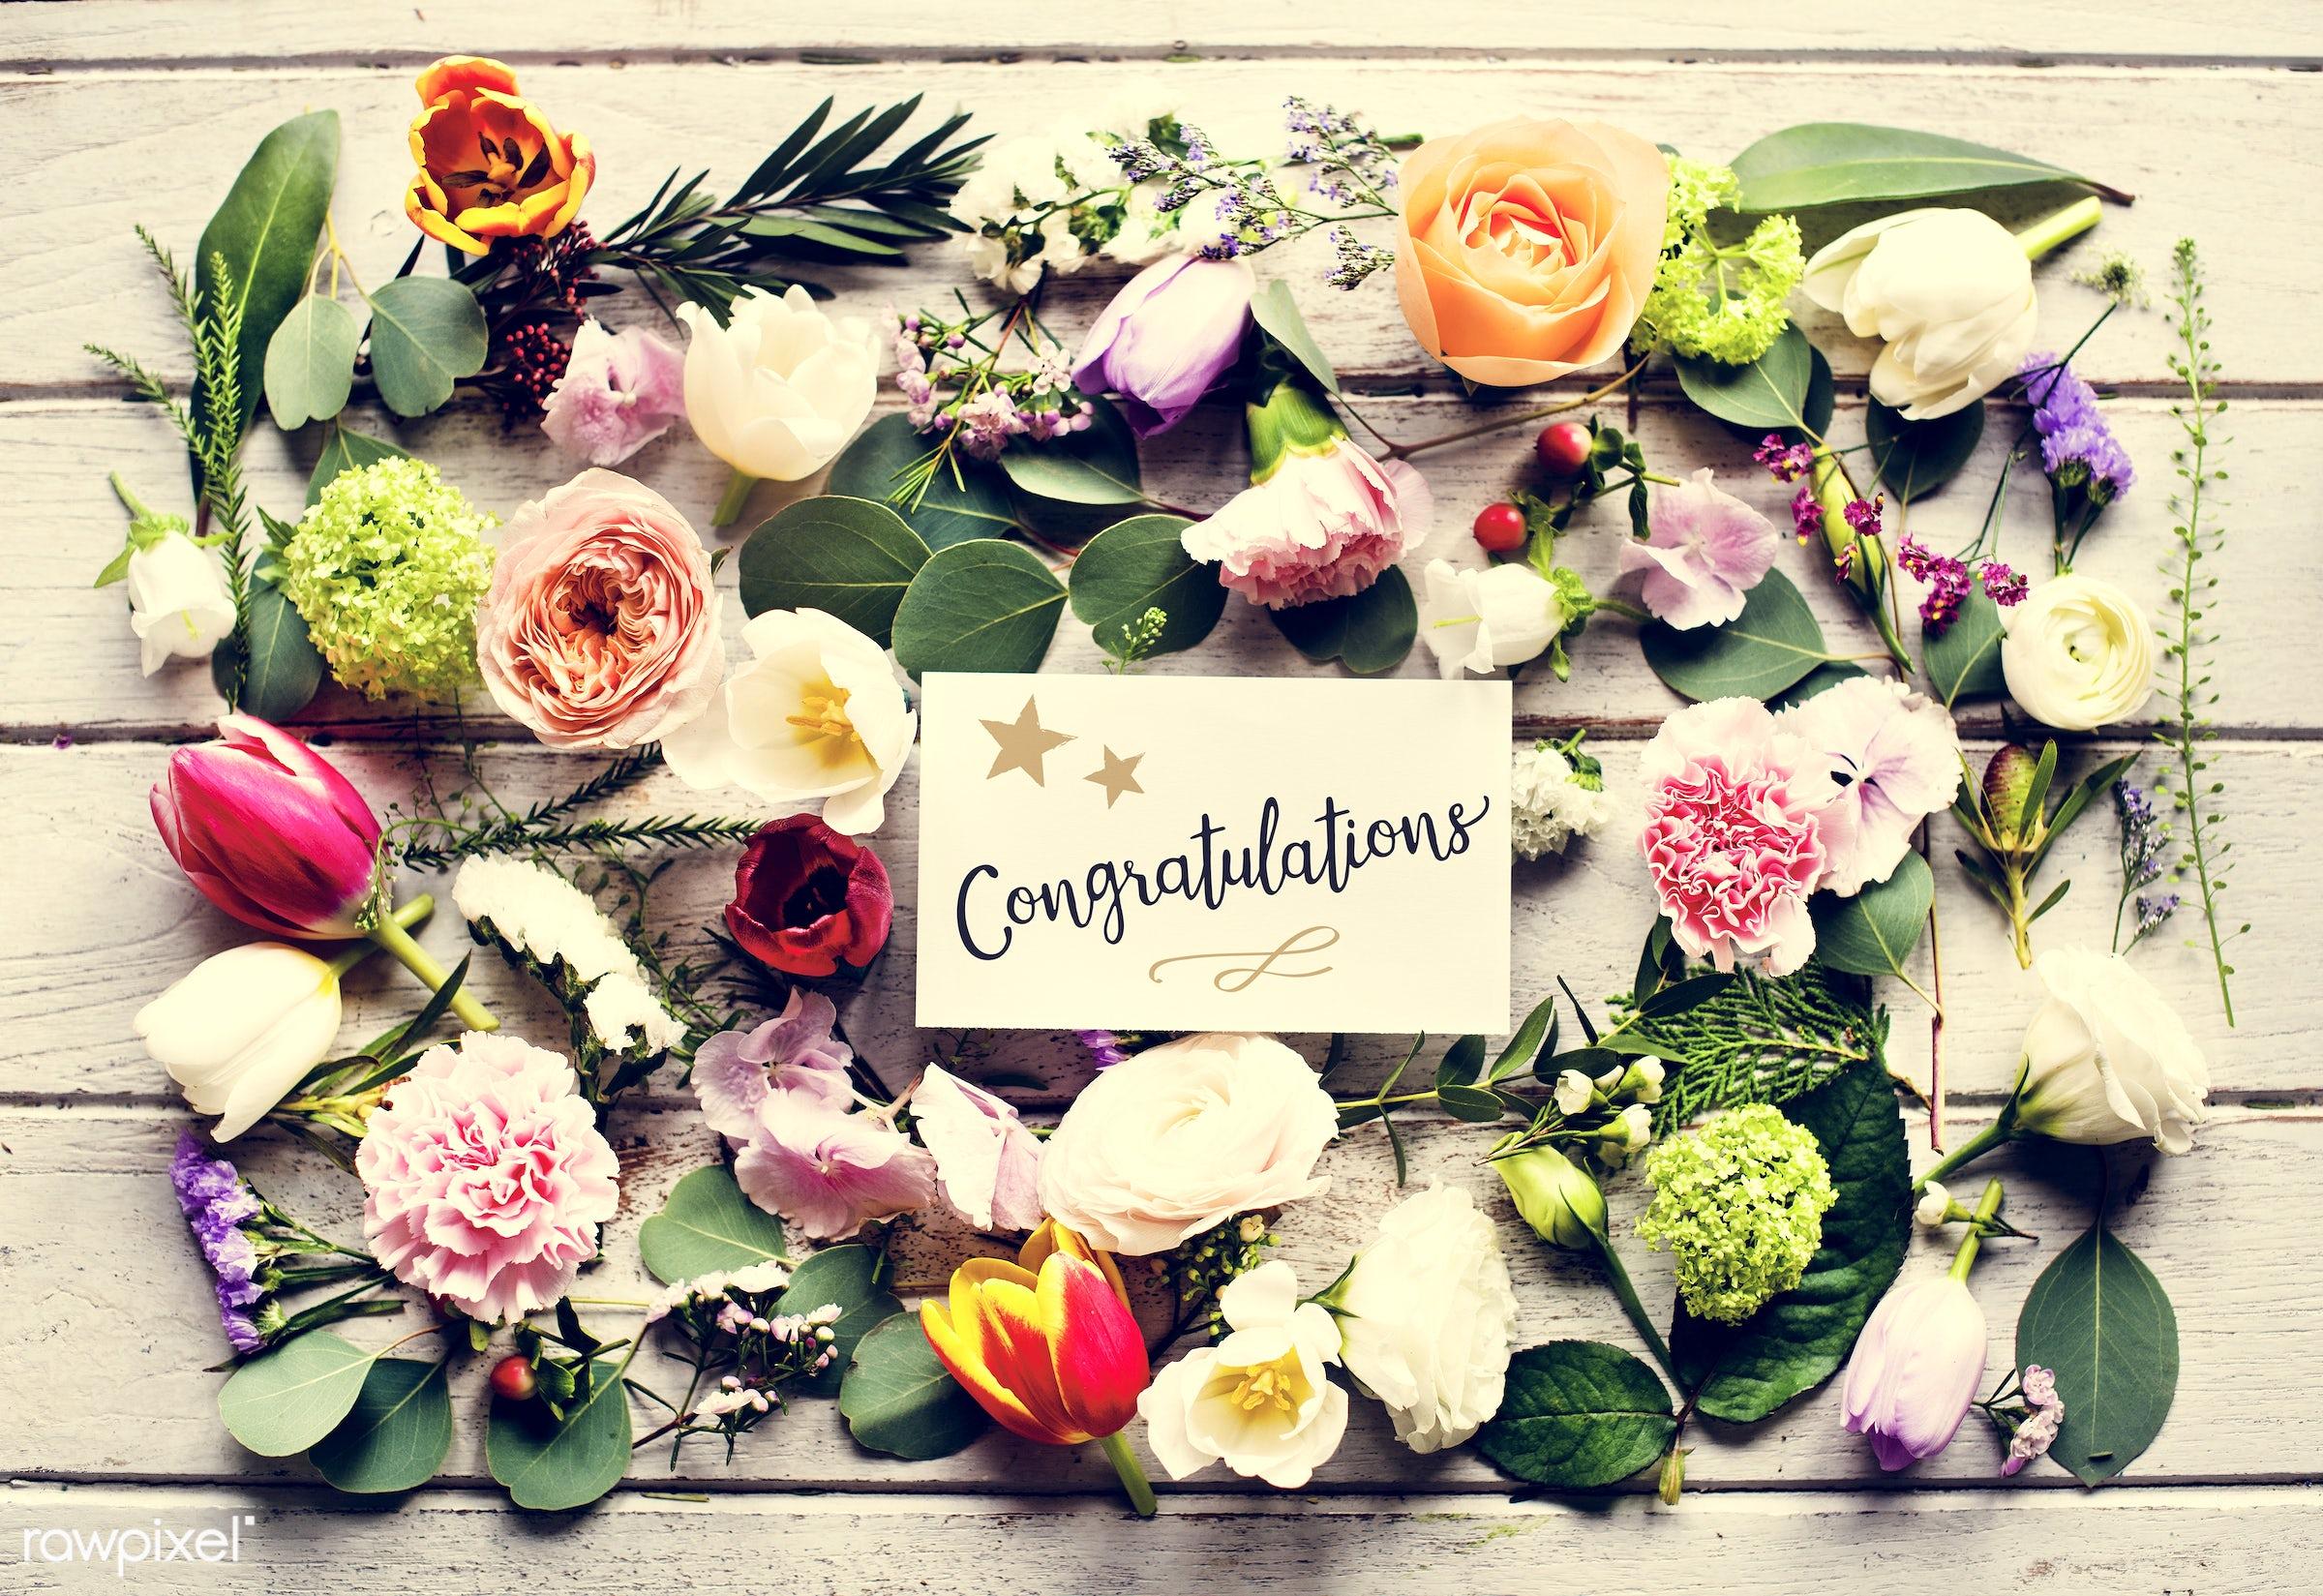 craft, aromatic, decorative, handicraft, beauty, collection, congratulations, spring, rustic, handiwork, blossom, style,...